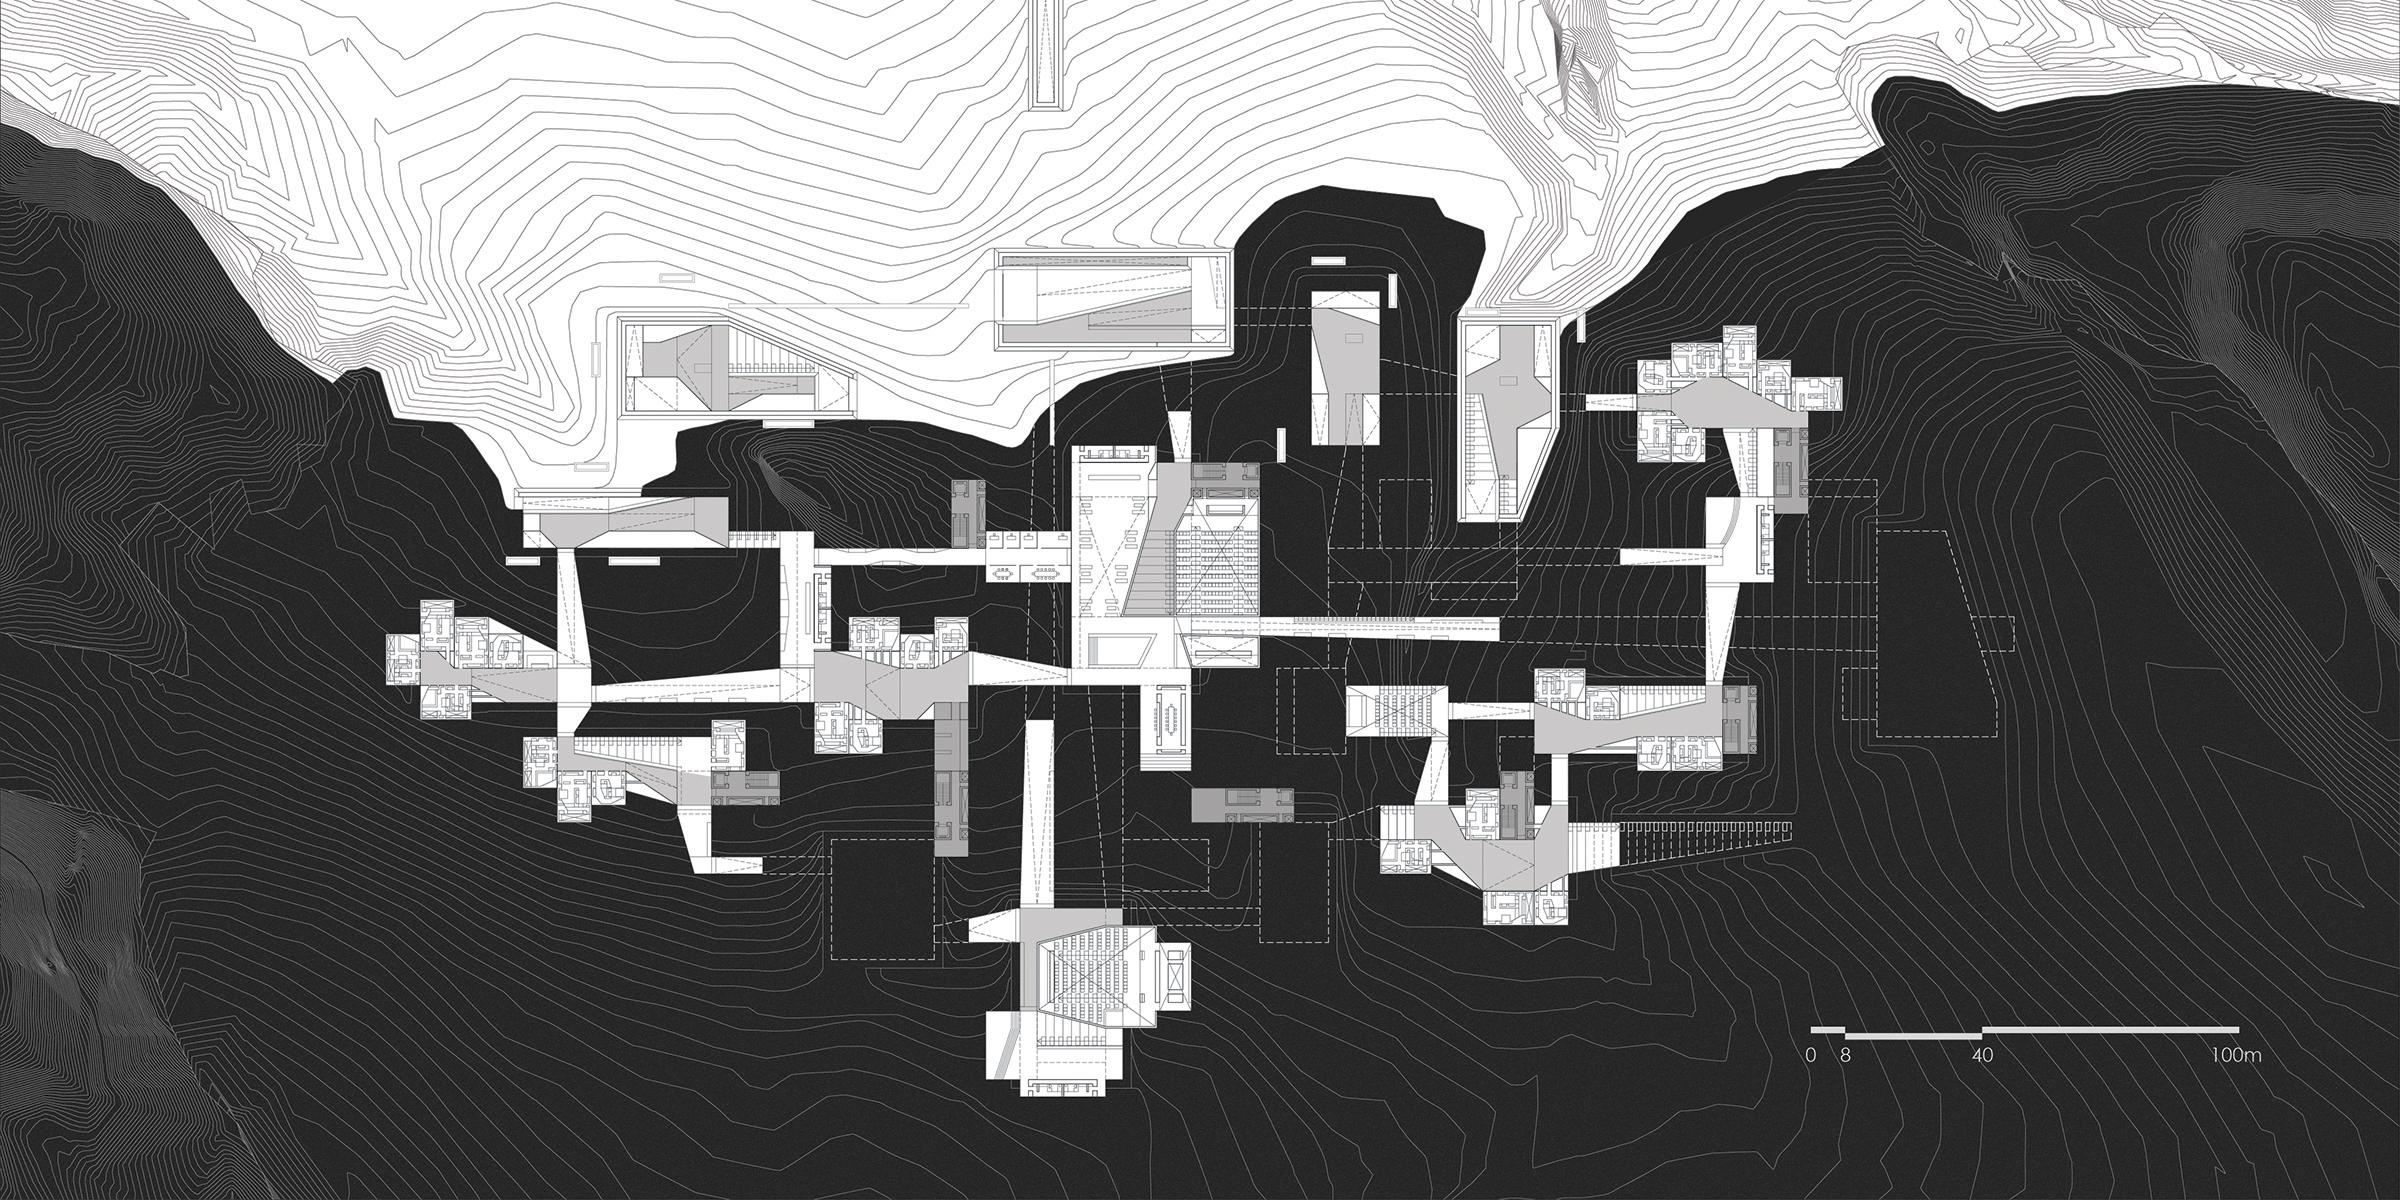 22_Floor Plan.jpg